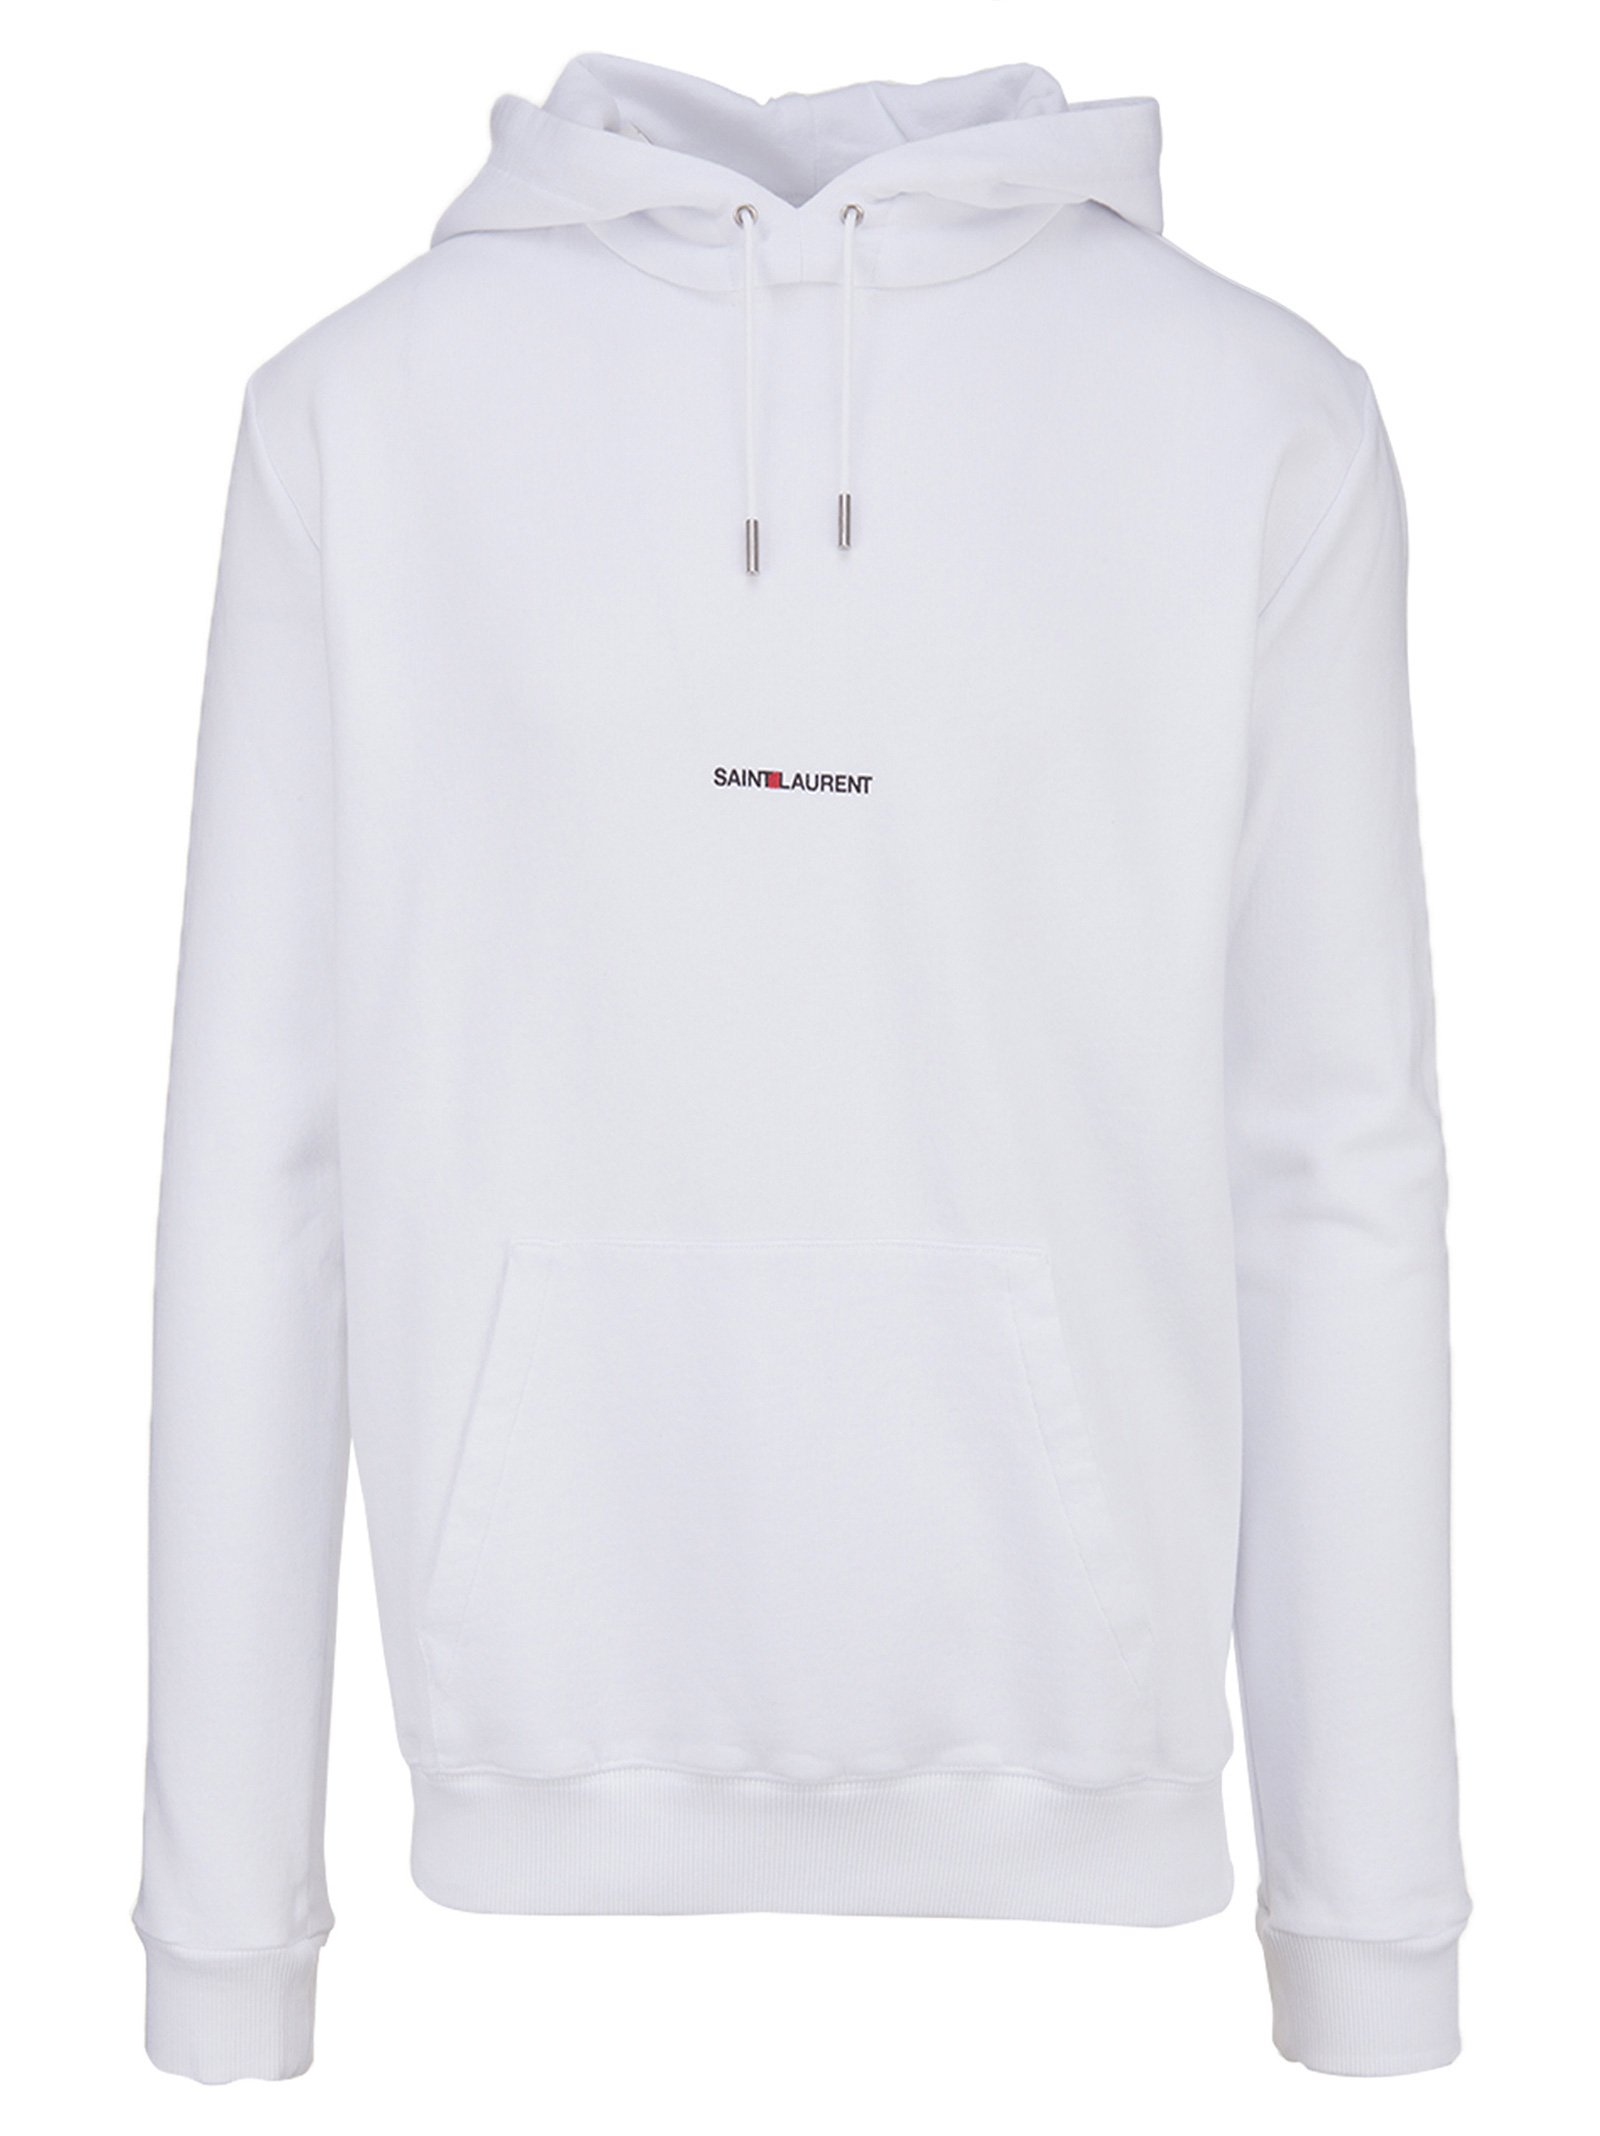 Saint Laurent Signature Sweatshirt  Saint Laurent   -108764232   464581YB2PG9000